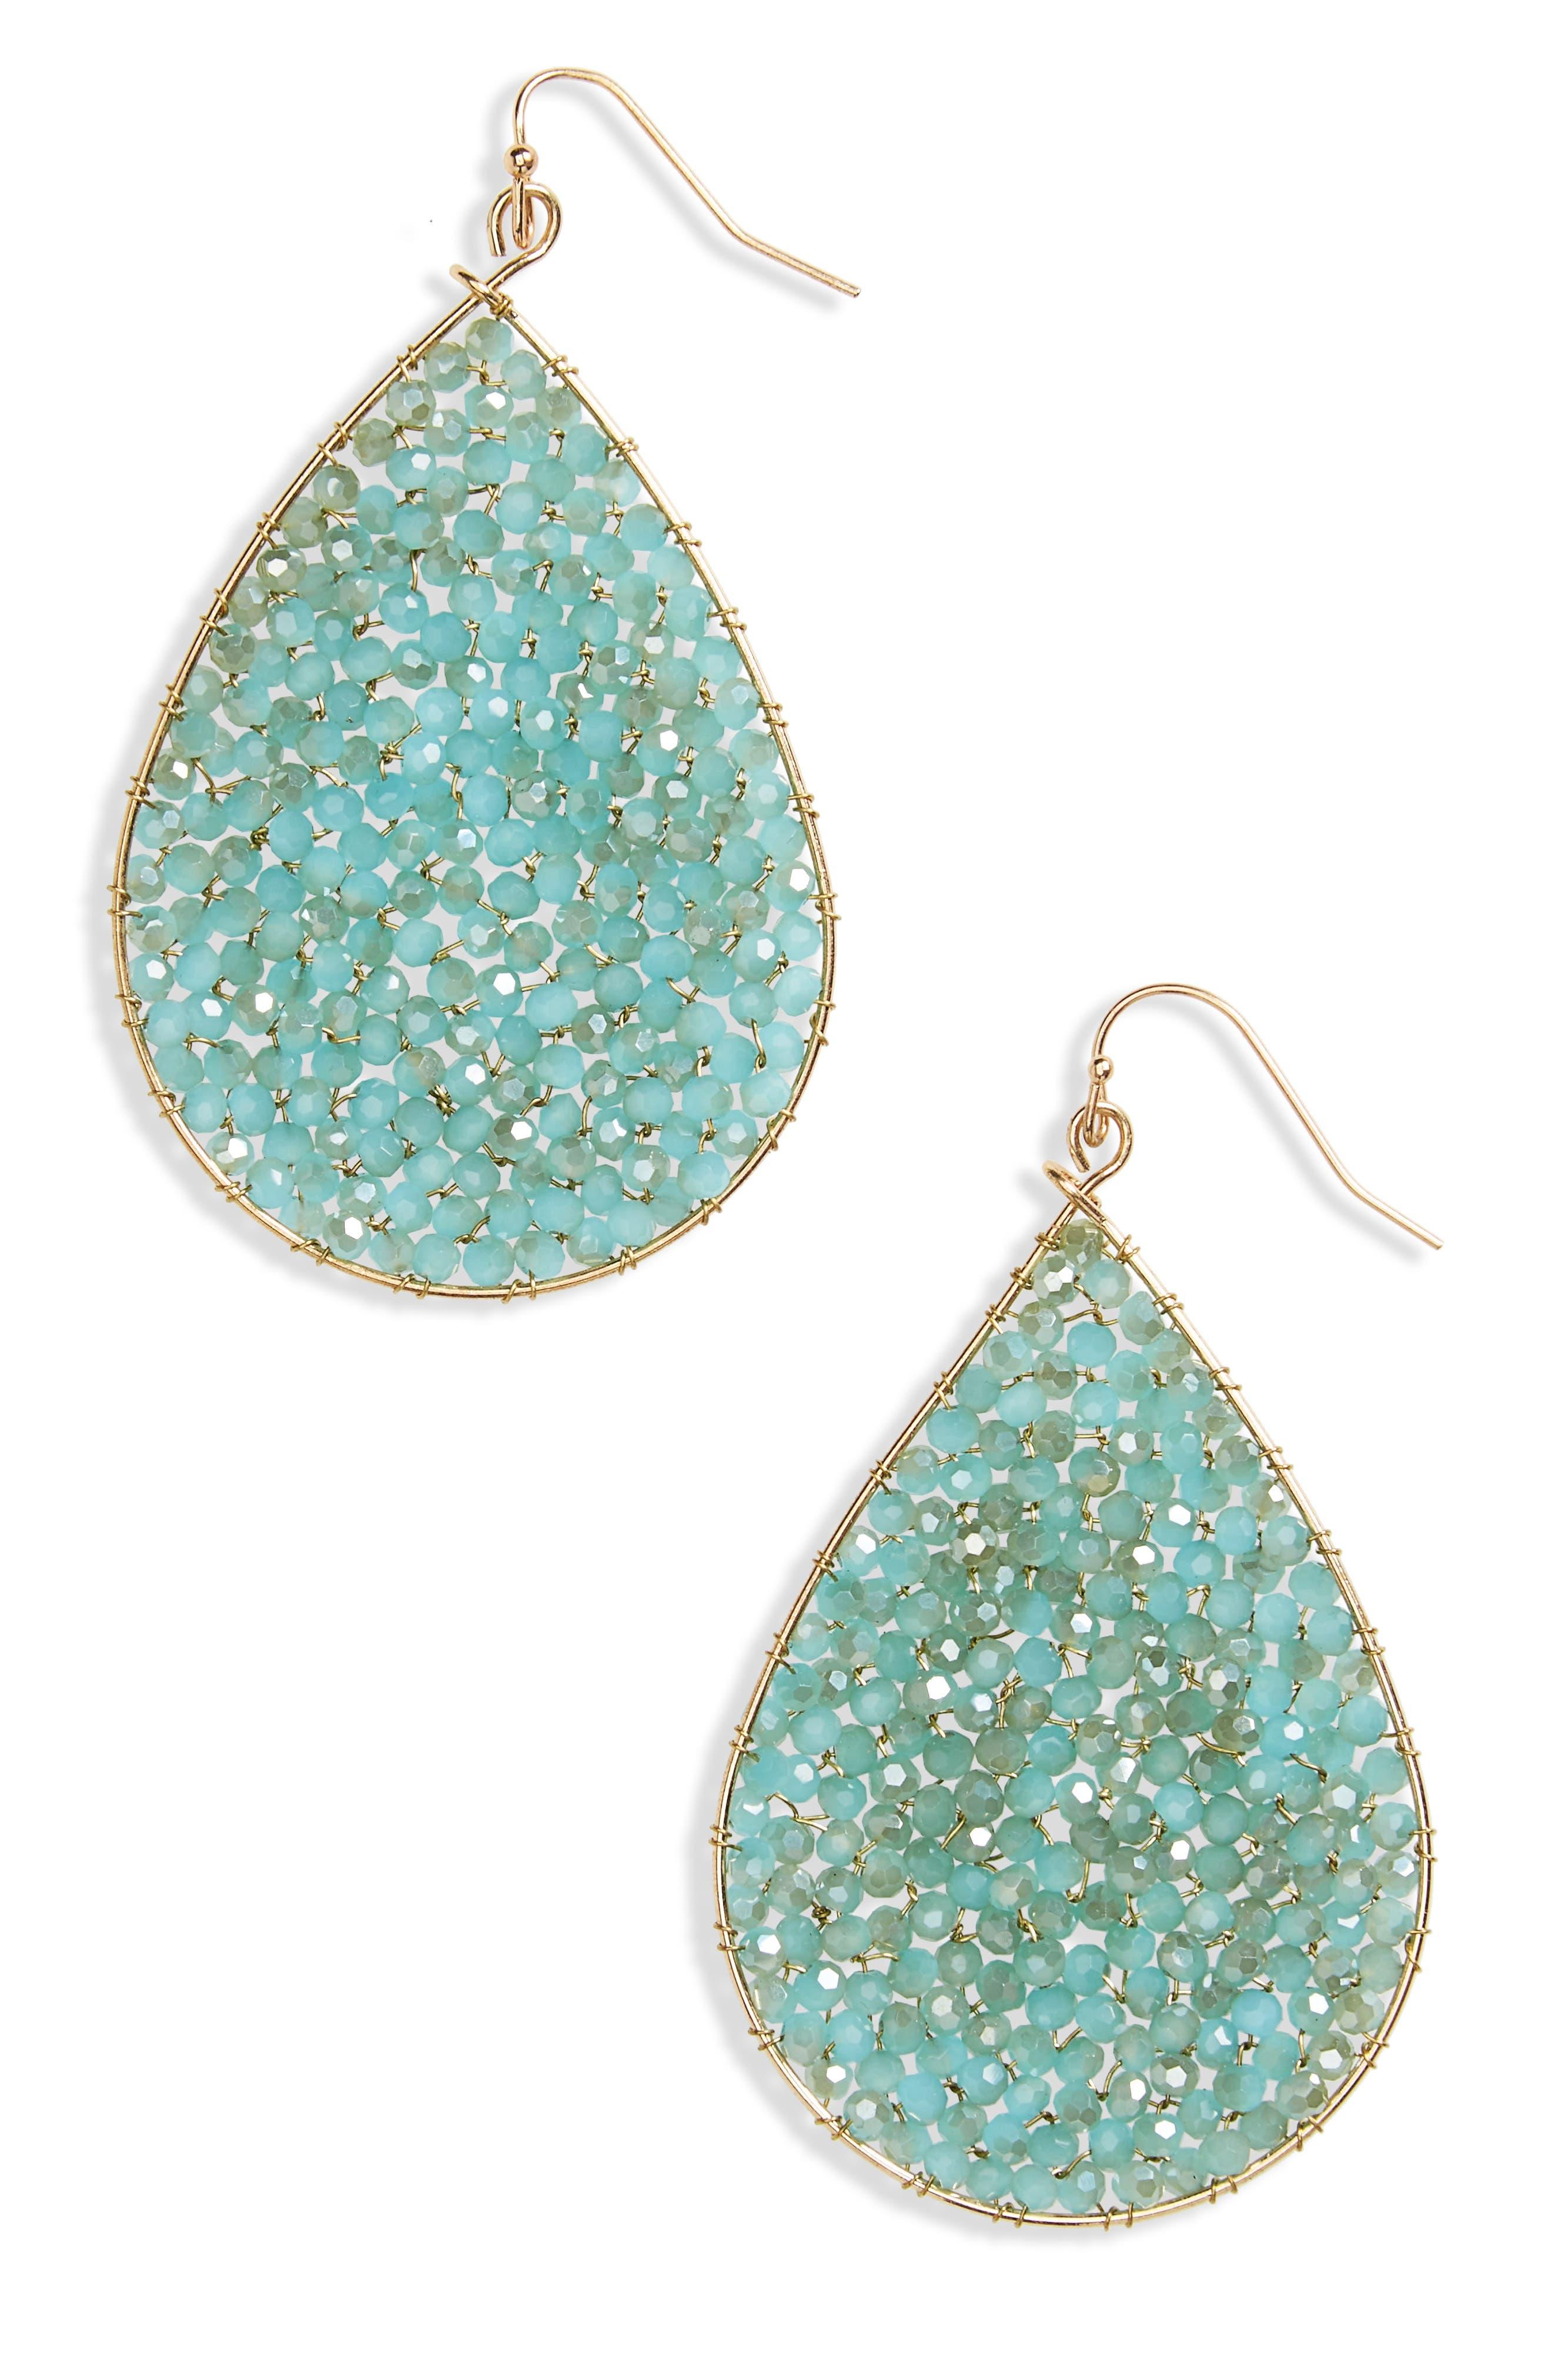 Crystal Teardrop Earrings,                             Main thumbnail 1, color,                             310